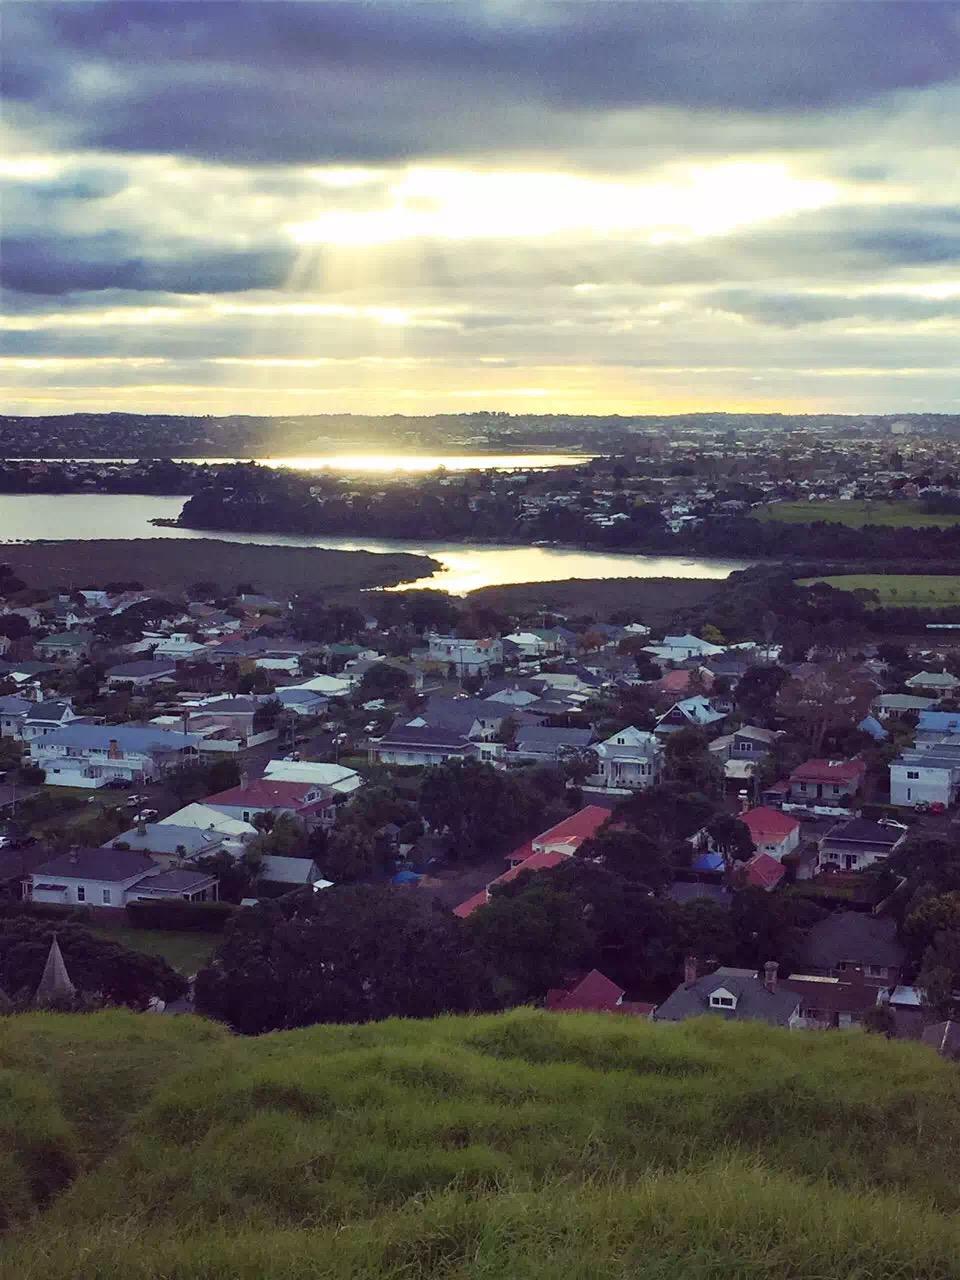 奧克蘭維多利亞山  Mount Victoria, Auckland   -2